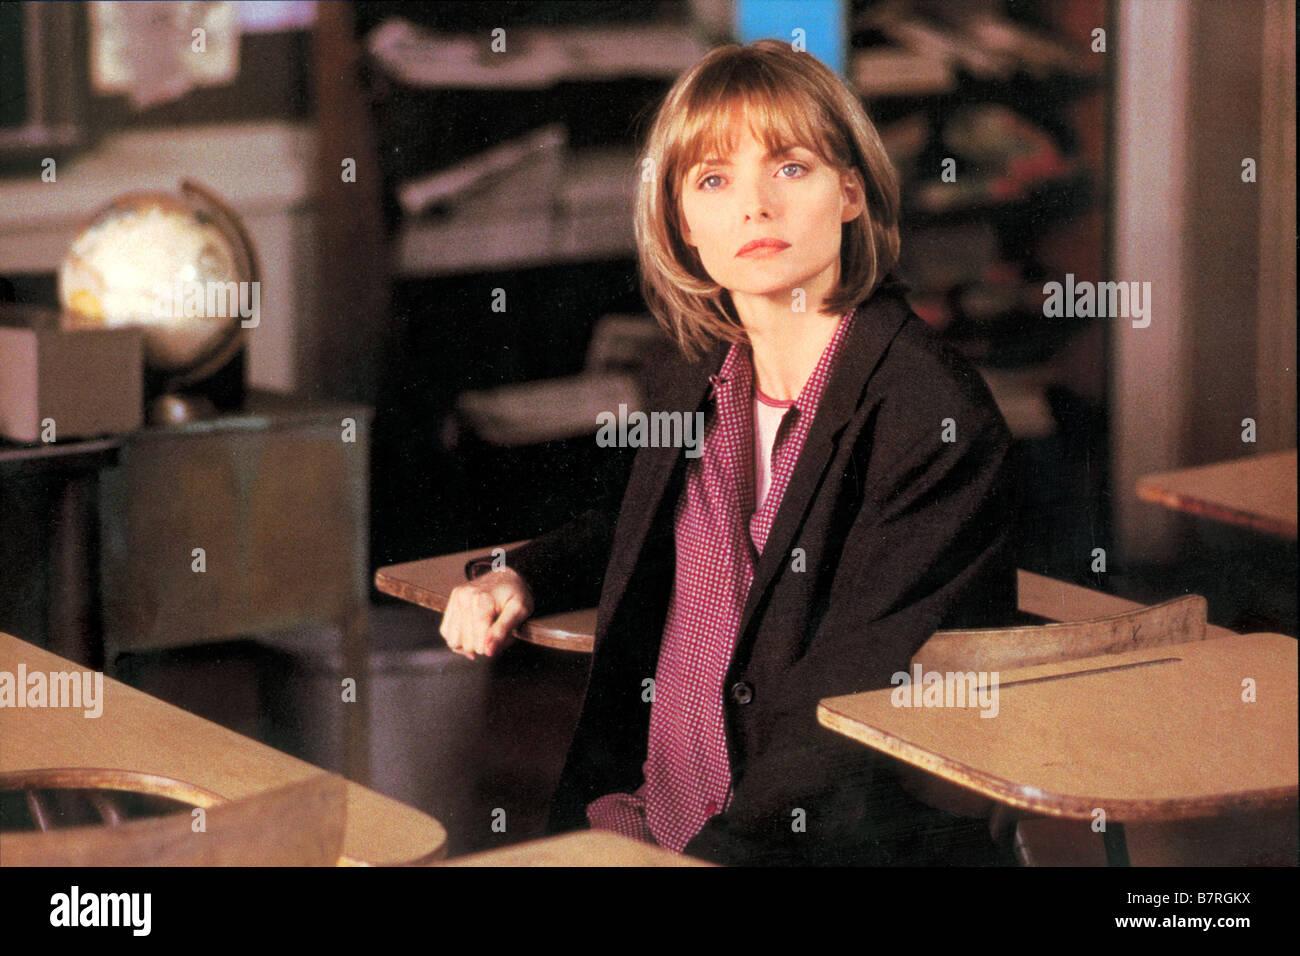 Dangerous Minds  Year: 1995 USA Michelle Pfeiffer  Director : John N.Smith Stock Photo